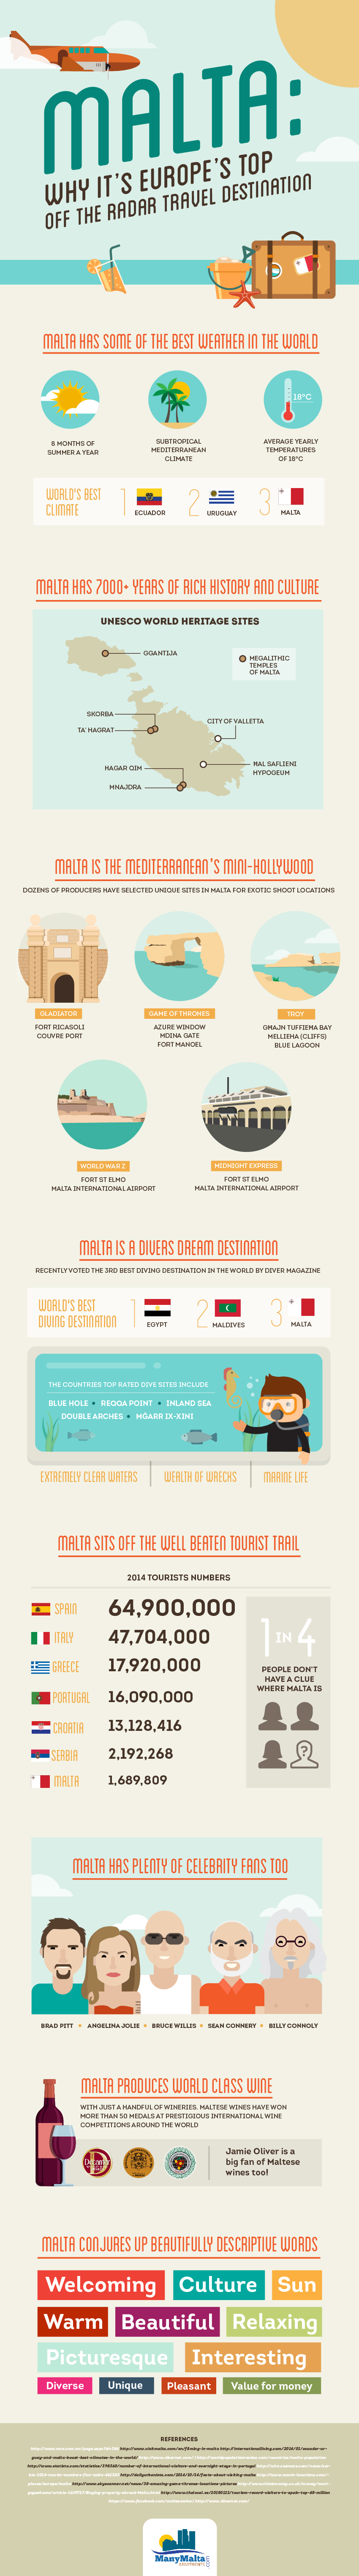 Malta: Why It's Europe's Top Off The Radar Travel Destination